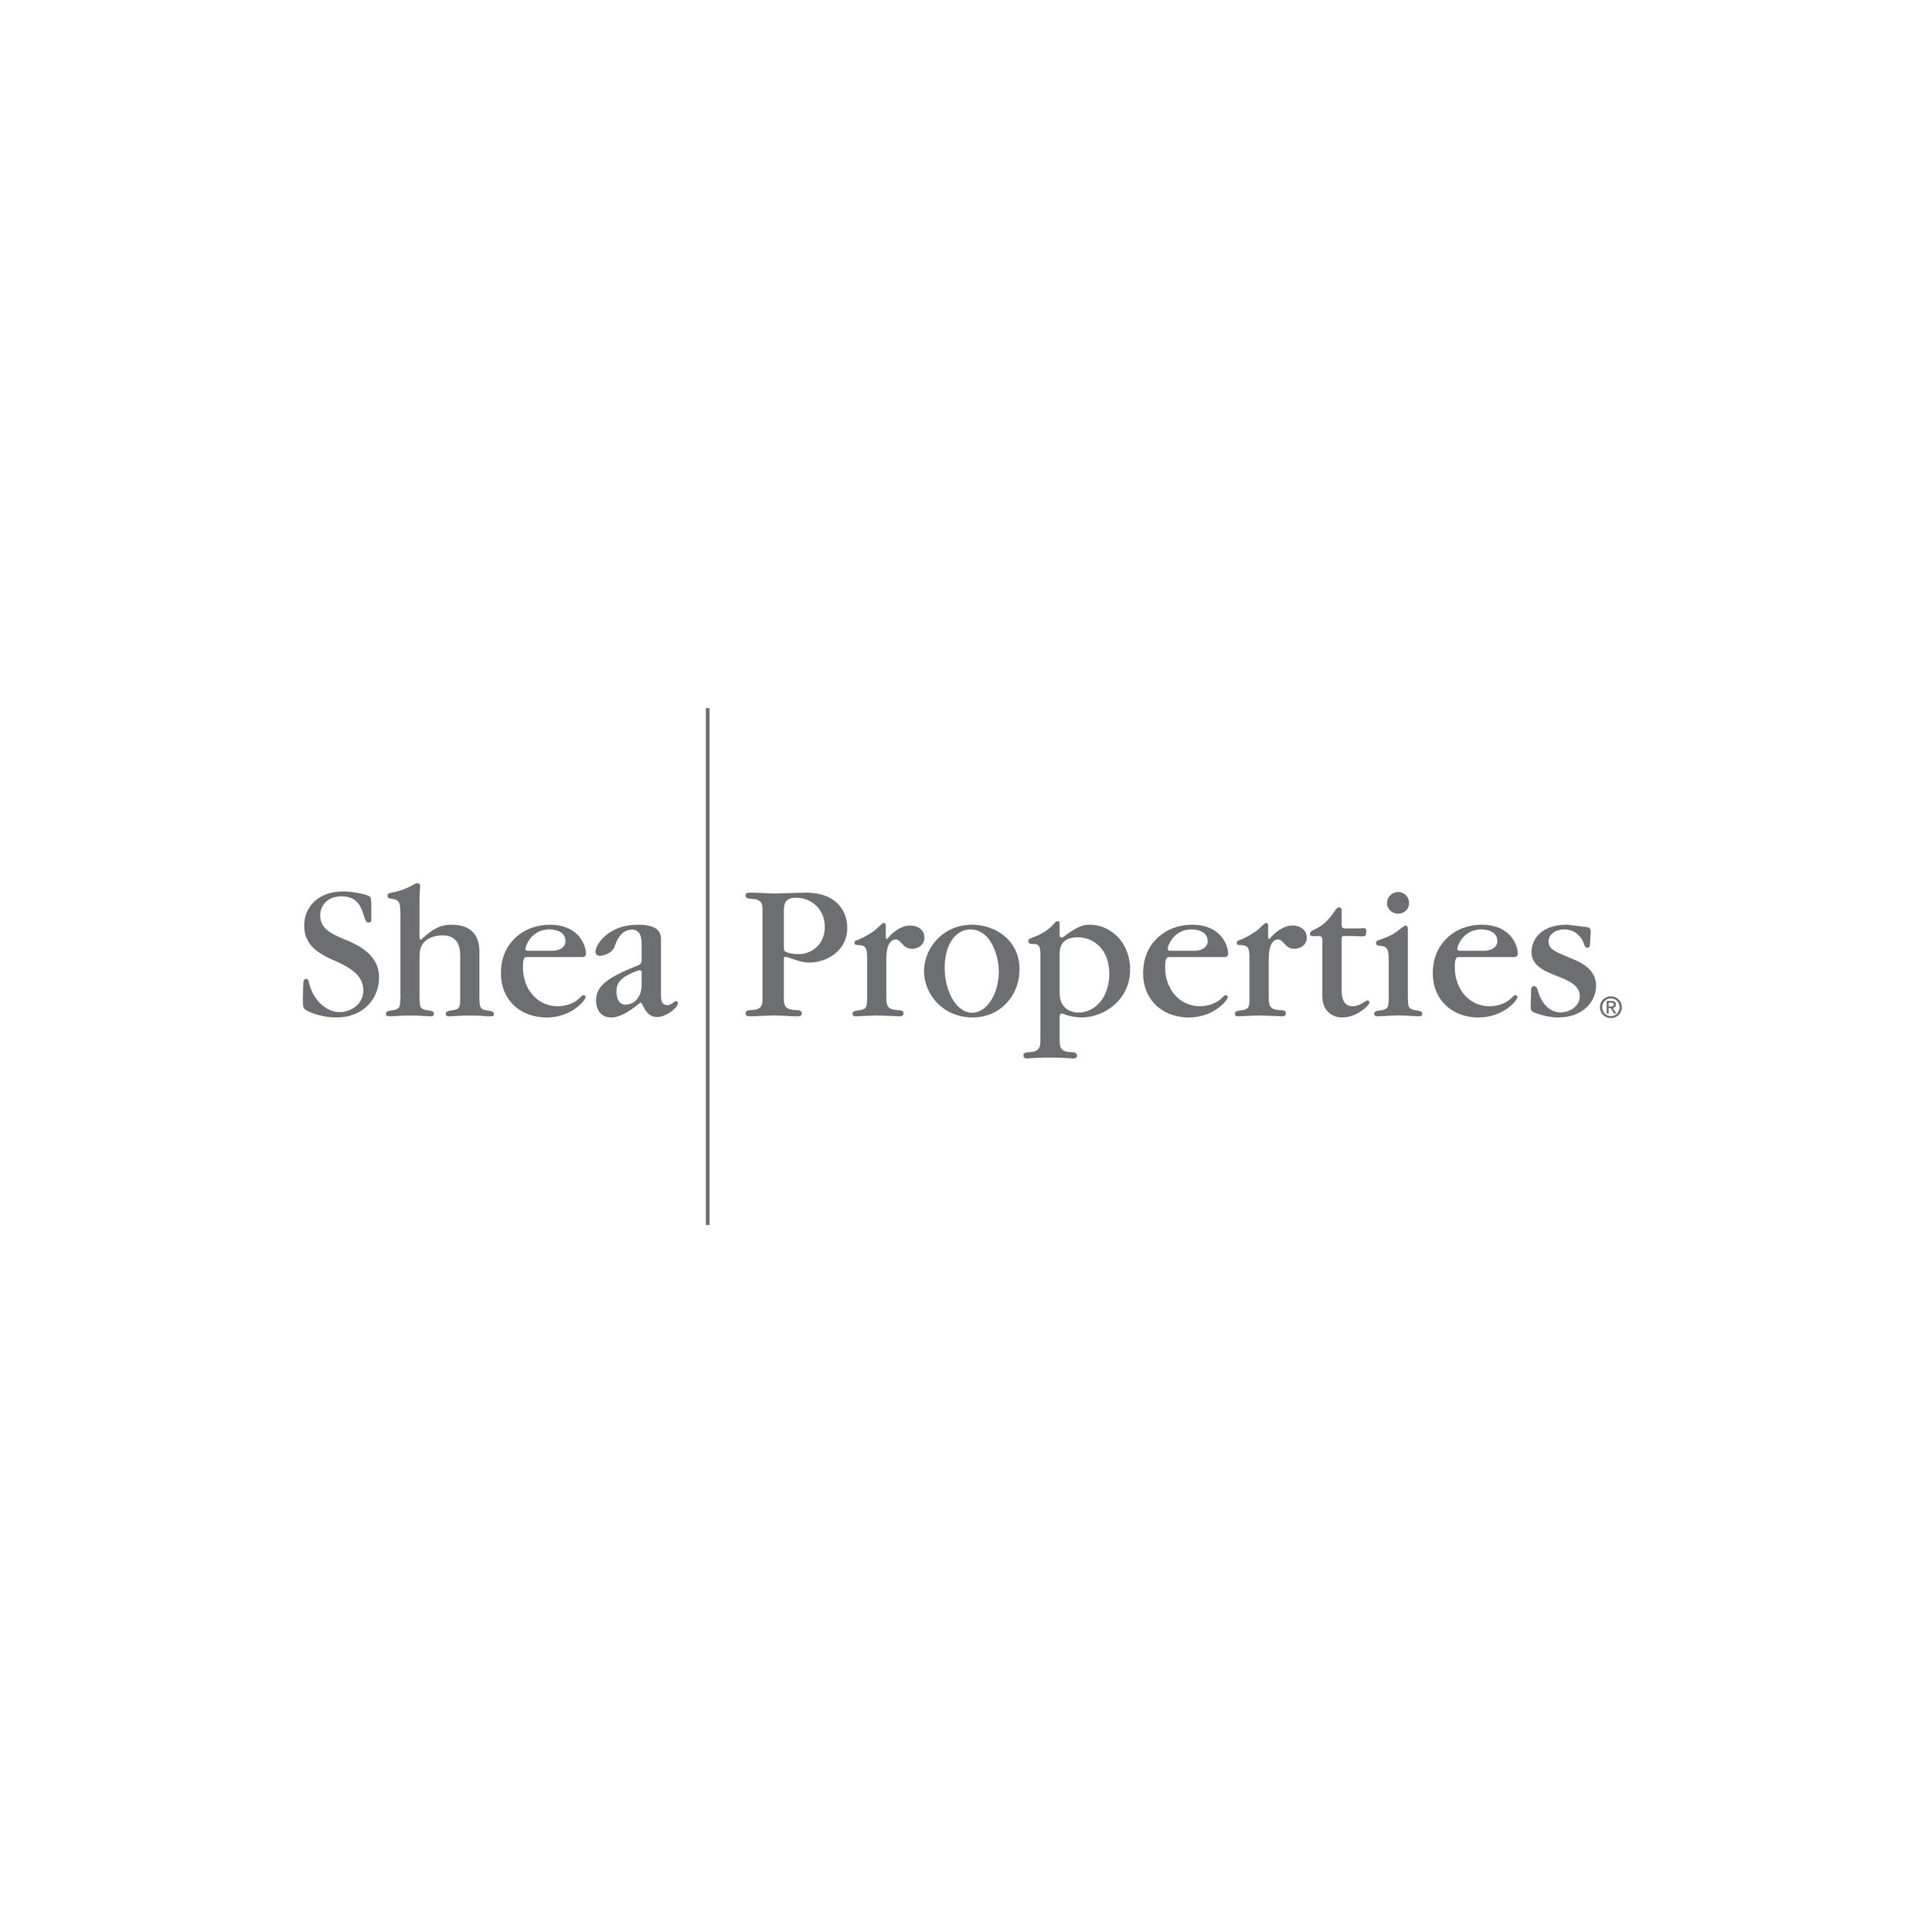 Logo-26-Shea Properties.jpg